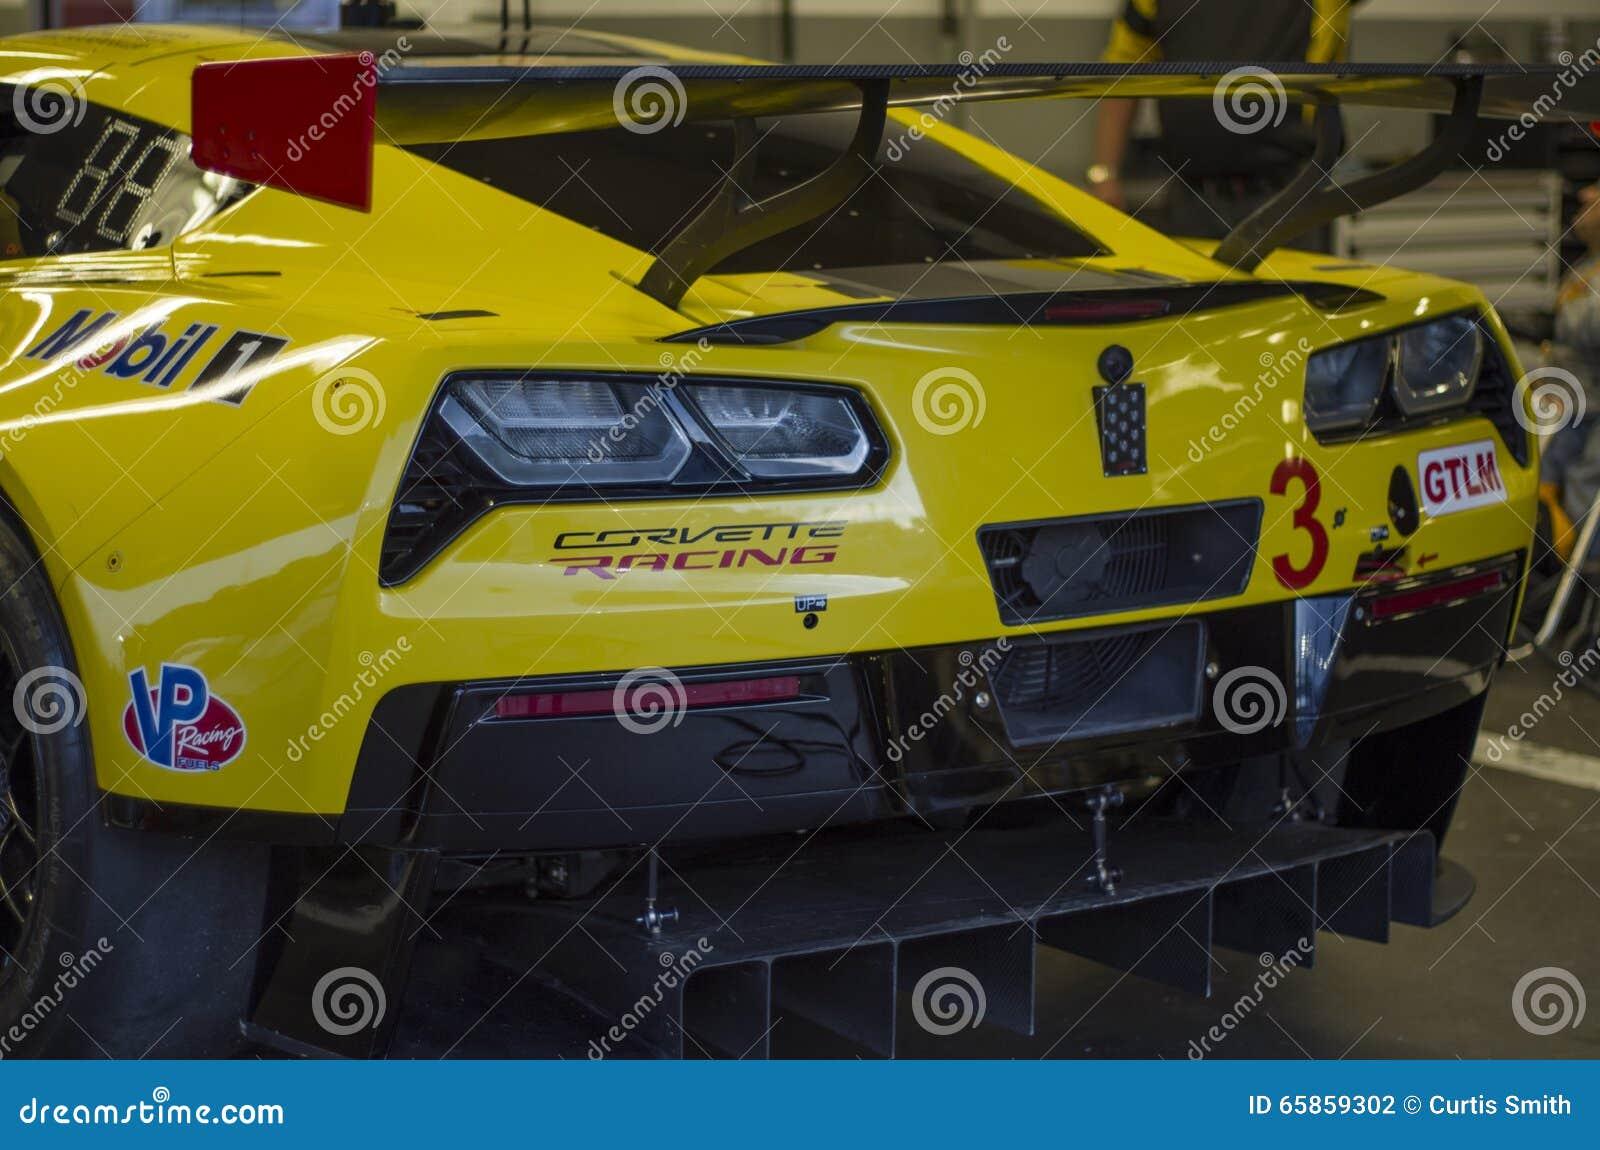 Chevy Corvette GT race car at Daytona Speedway Florida